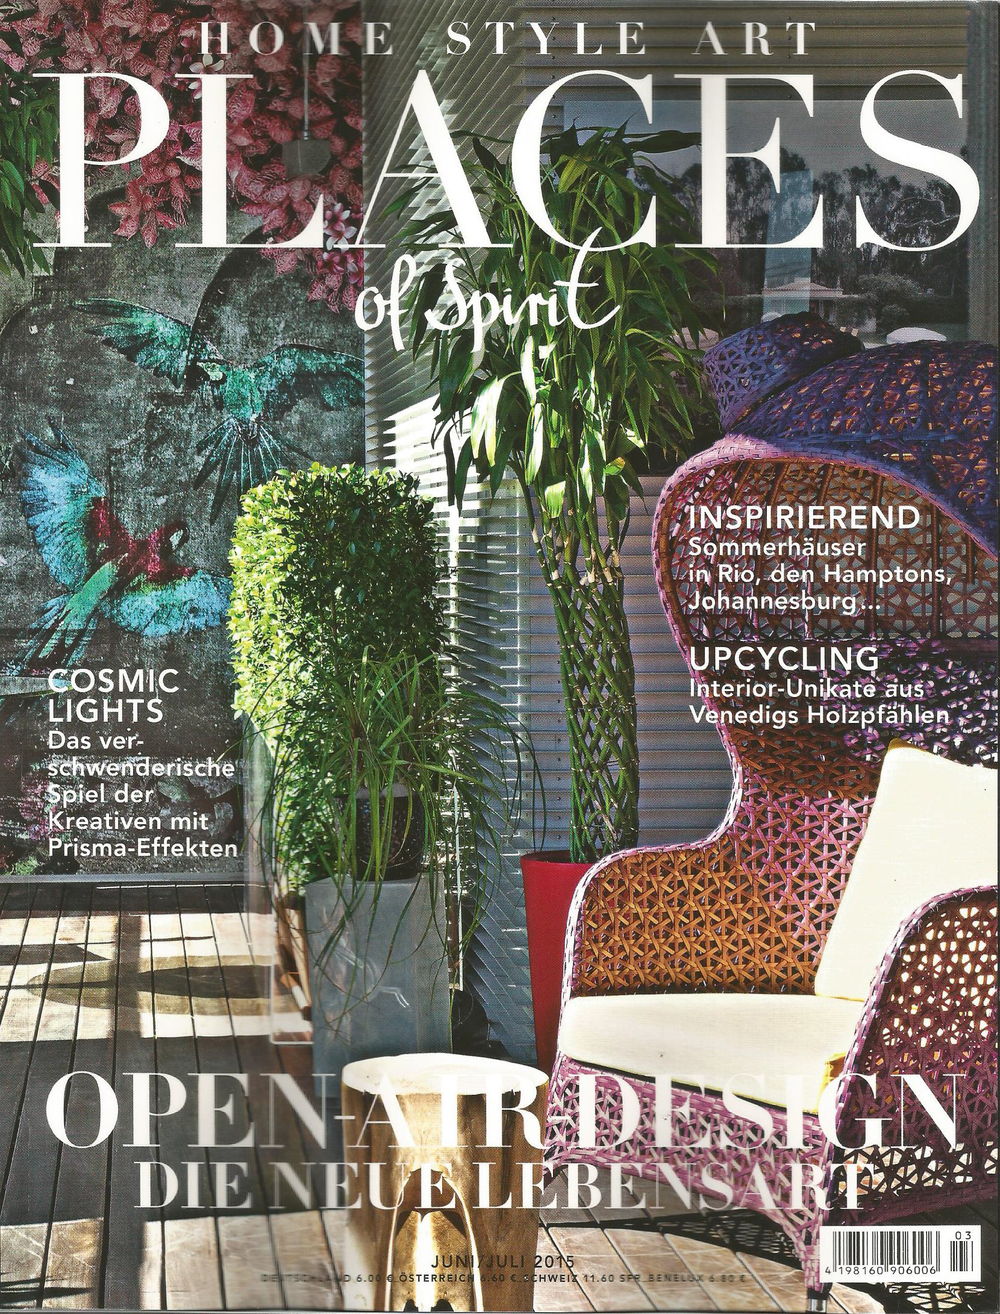 PlacesMagazine.jpg